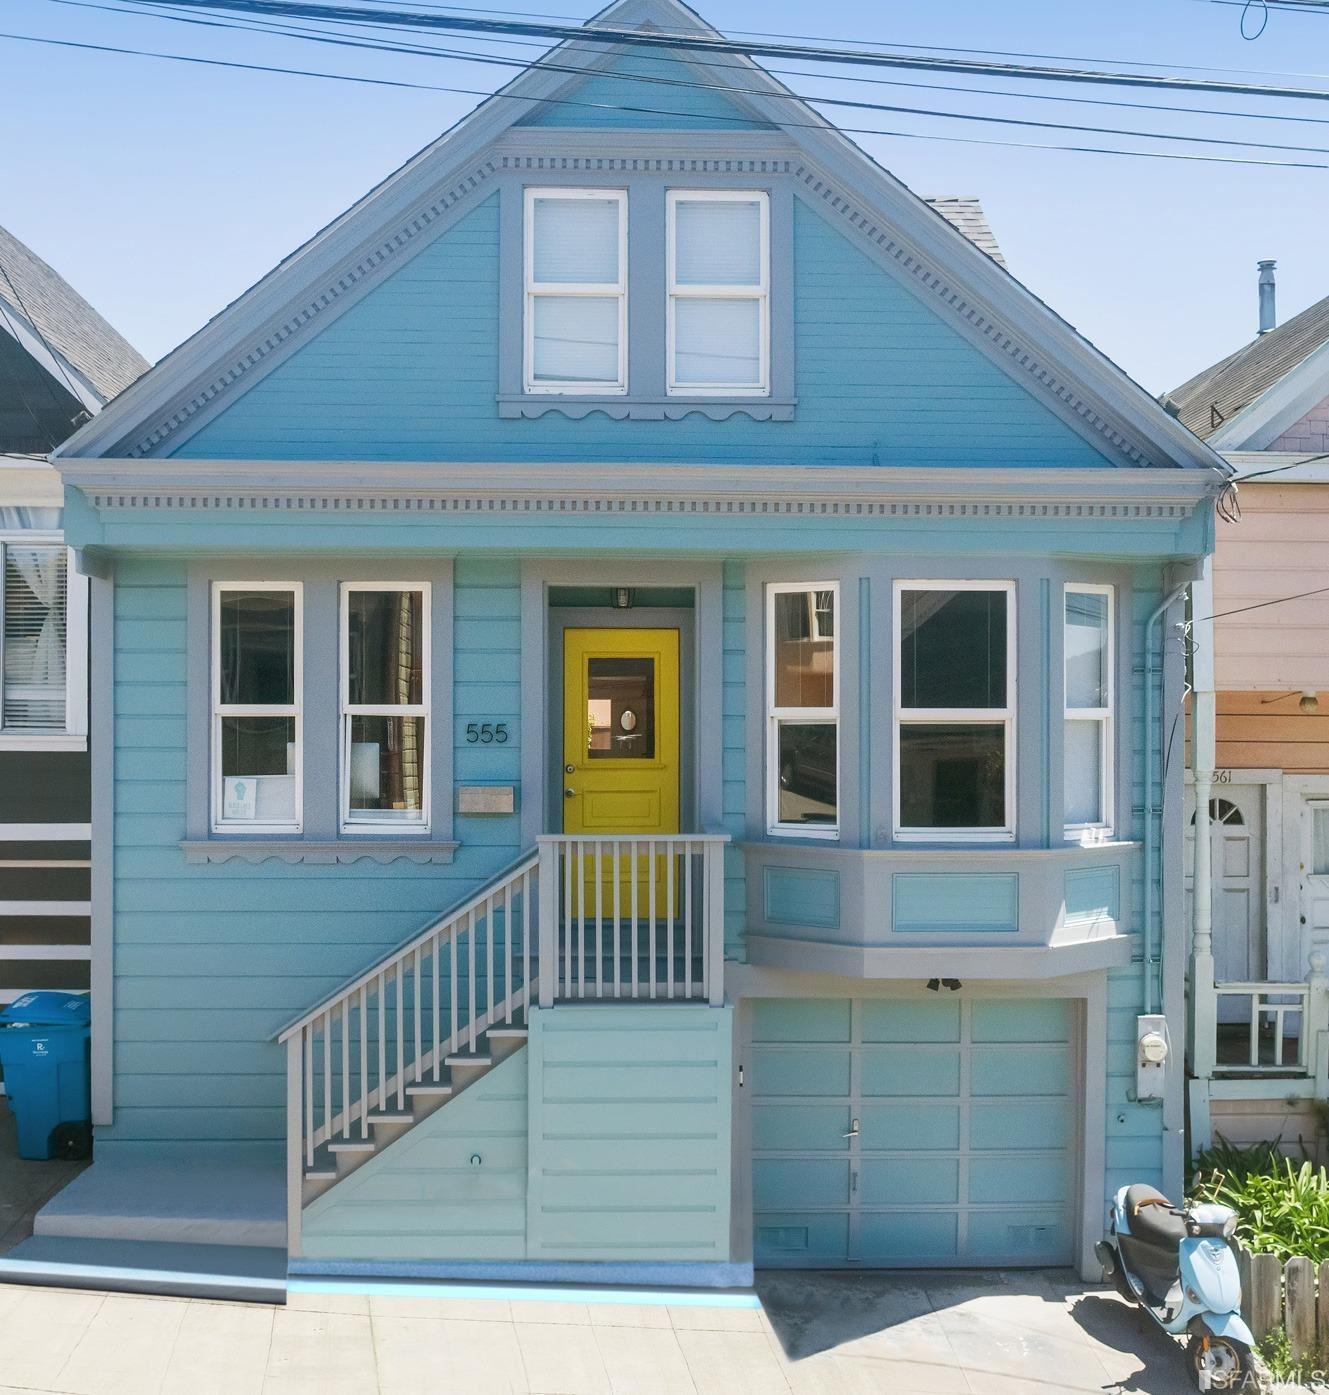 555 Moultrie Street, San Francisco, CA 94110 - #: 421543813